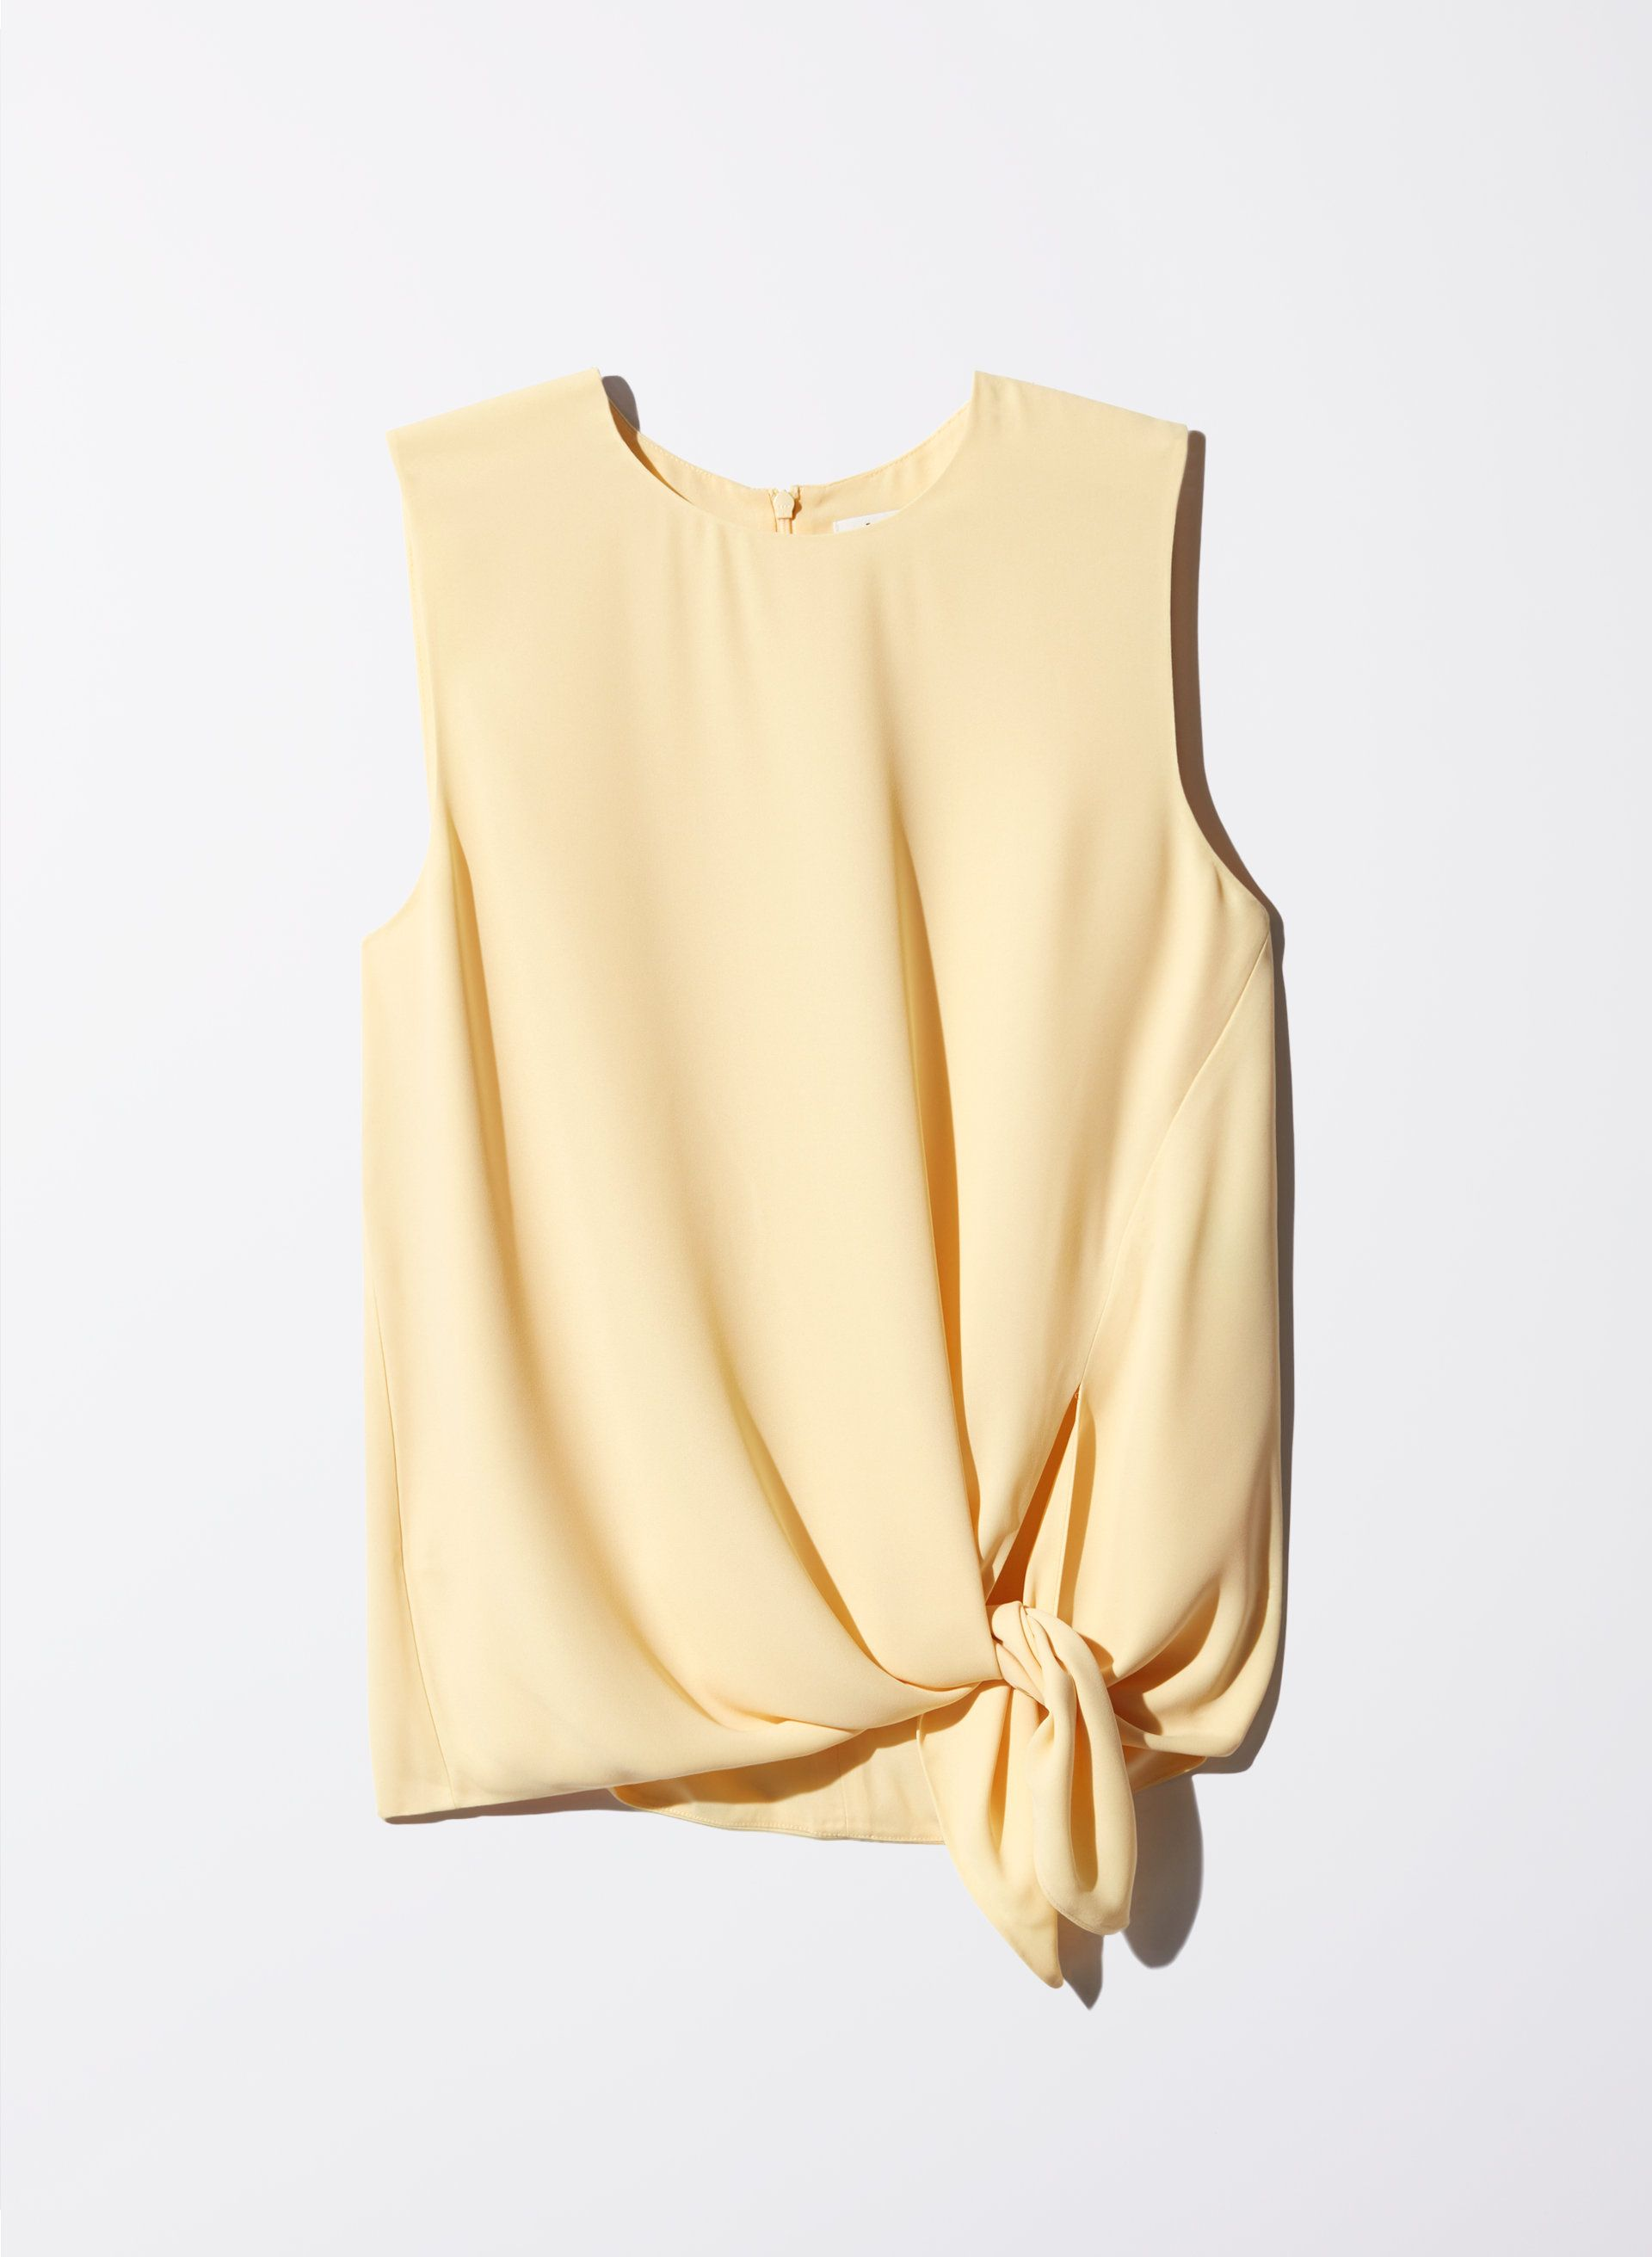 f43f52c426f29a Hopkins blouse in 2019   stitch fix inspiration   Blouse, Tie blouse ...